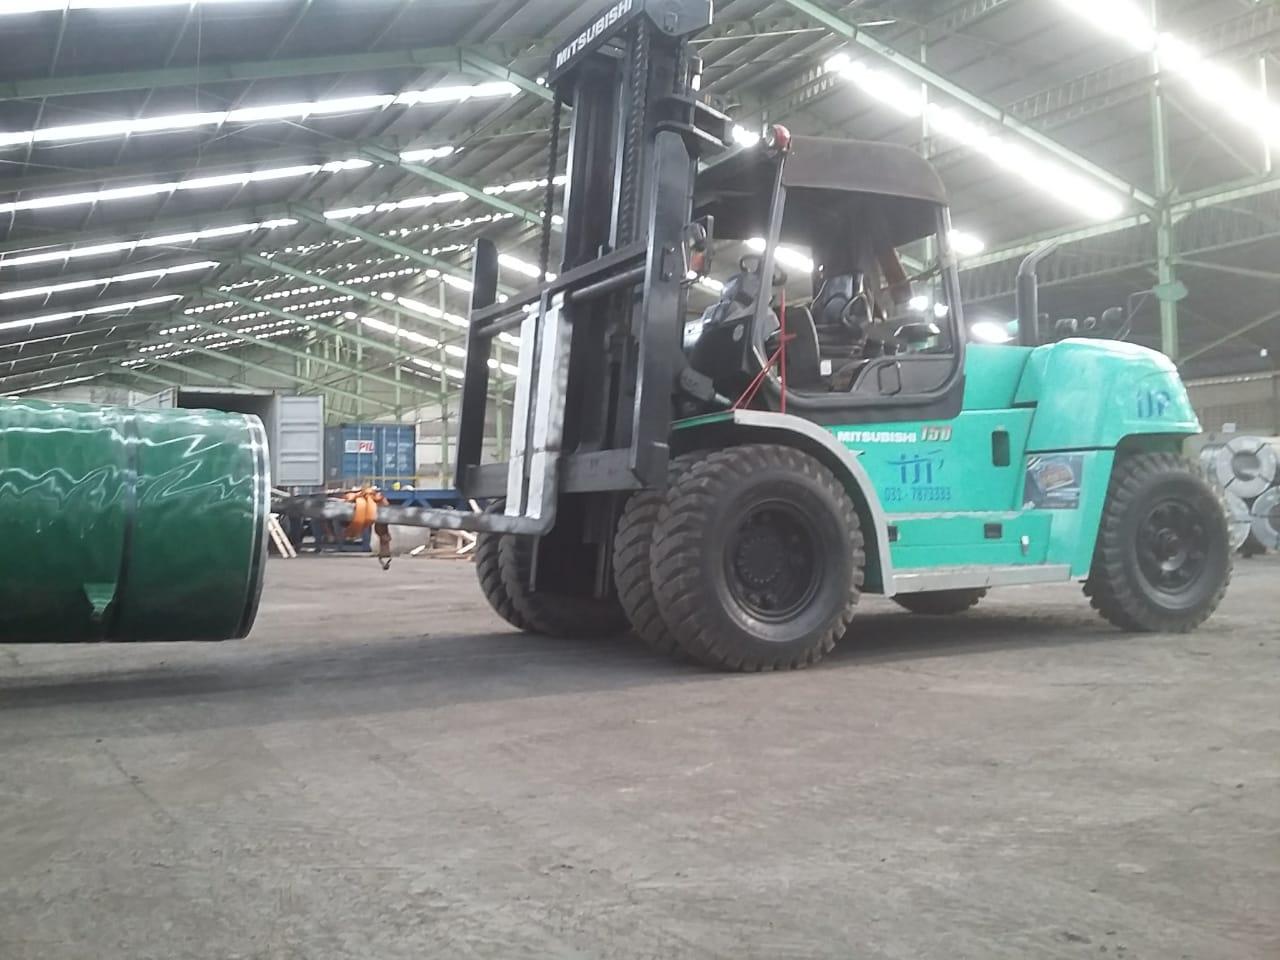 Panduan Sewa Forklift Rungkut Surabaya, apa saja yang penting ?